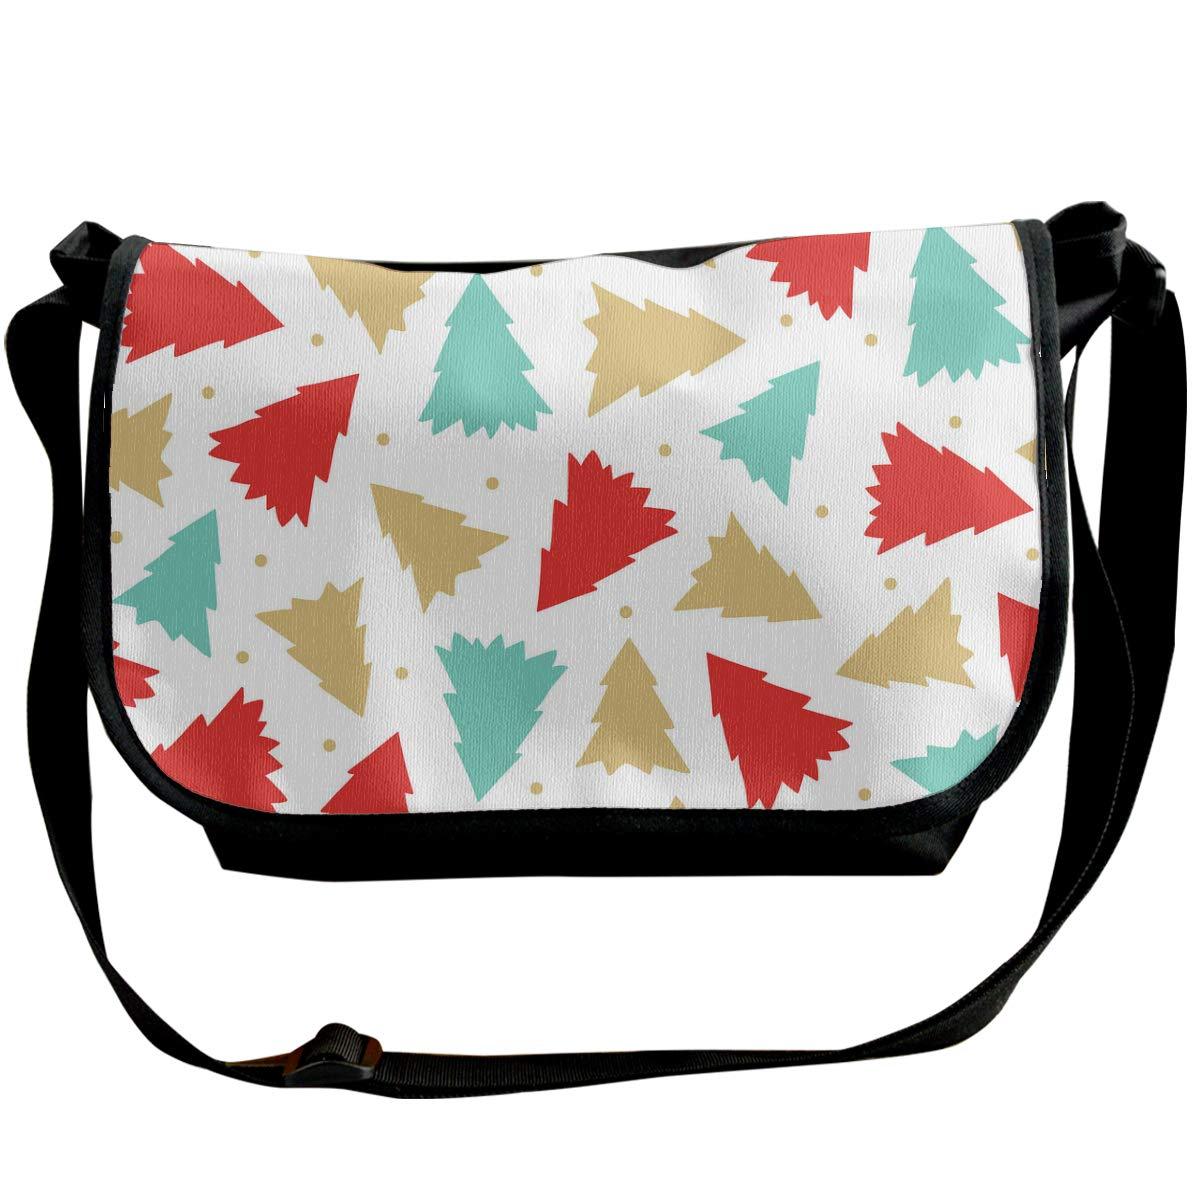 XIANGXIANG SHOP Pencil Pattern Fashion Unisex Casual Popular Outdoor Sling Bag Messenger Bag Shoulder Bag